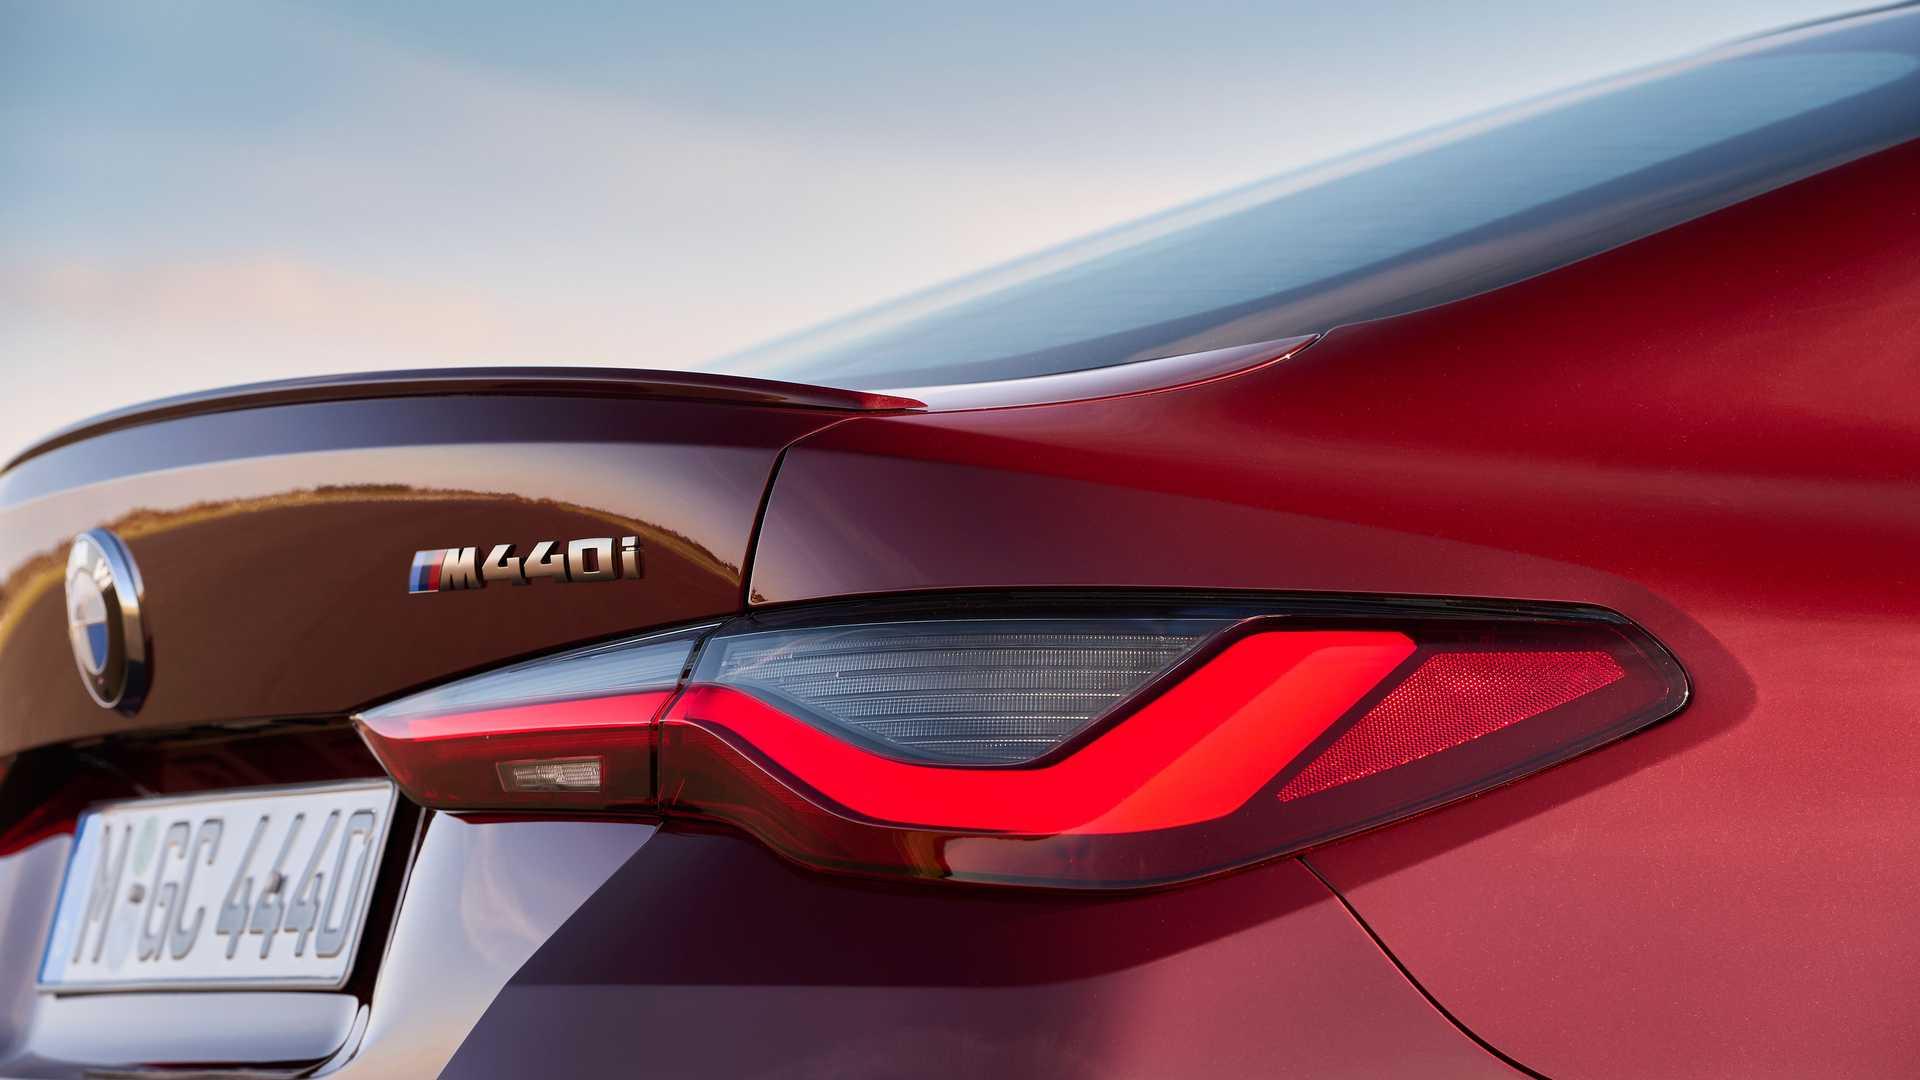 BMW تم الكشف عن سيارة 2022 BMW 4 Coupe بمساحة وأناقة أكبر